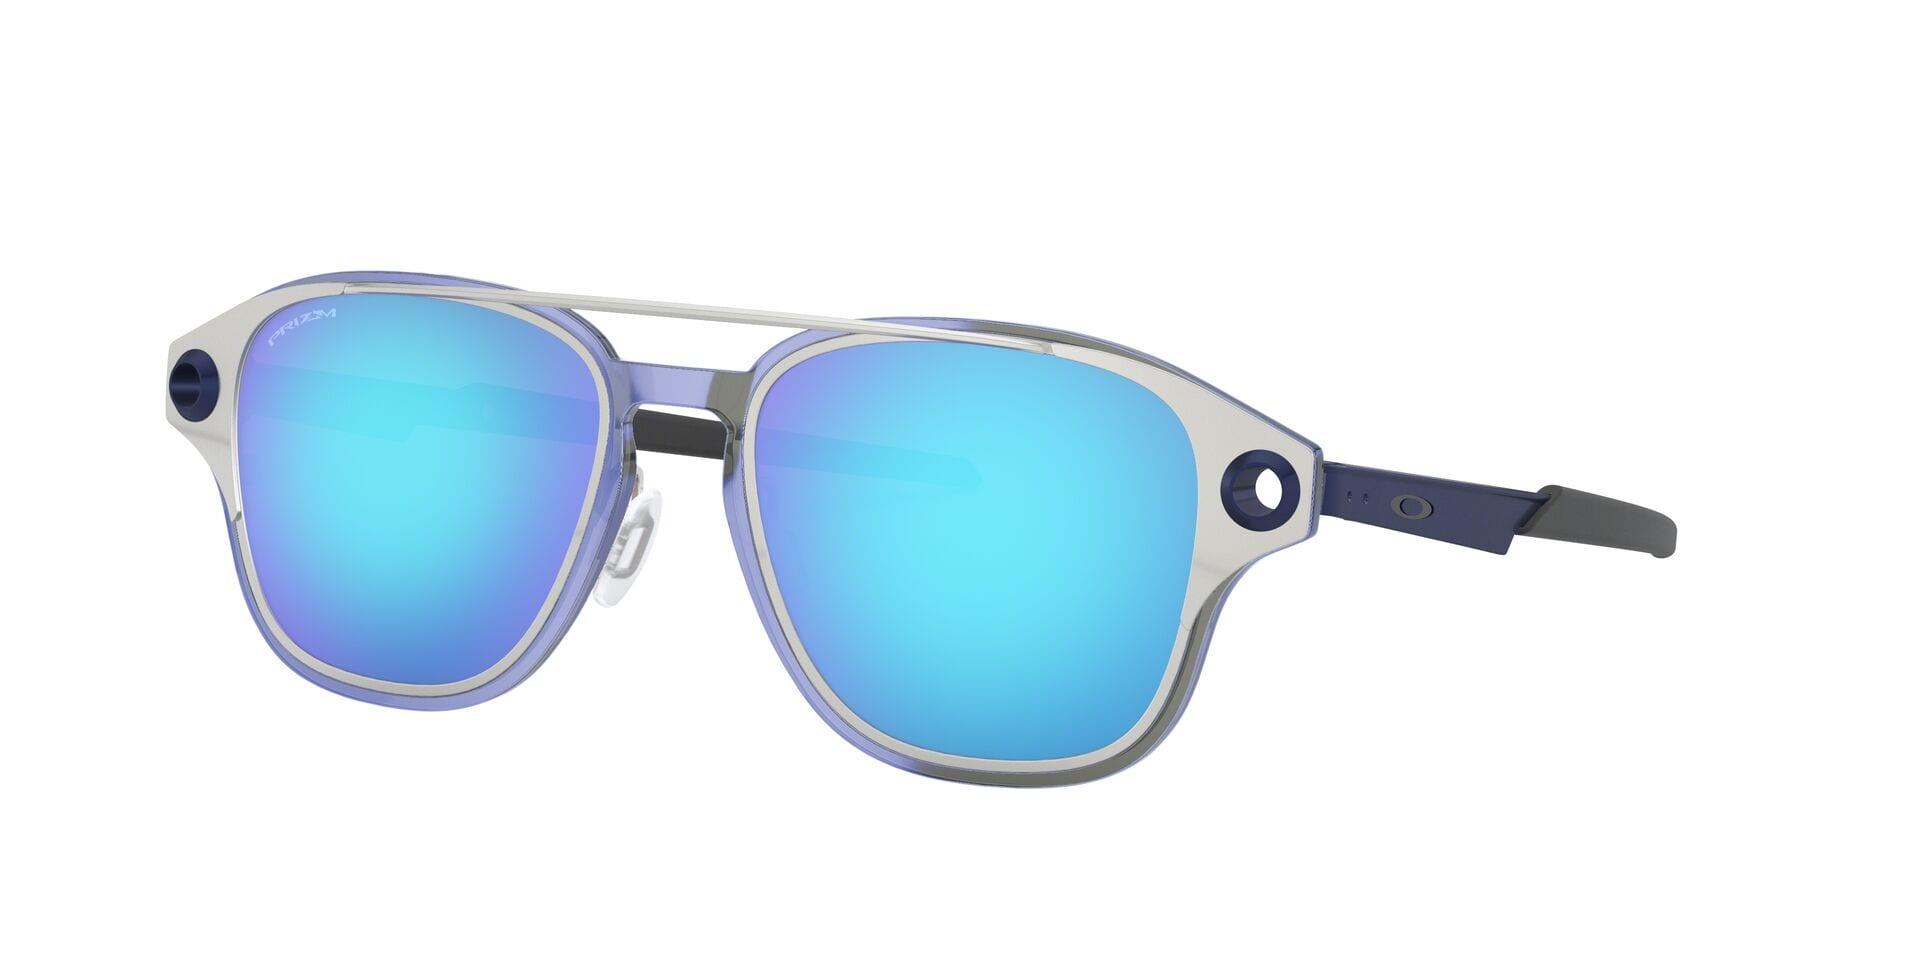 584b97360920f Oakley Coldfuse Men s Sunglasses - ADS Lifestyle